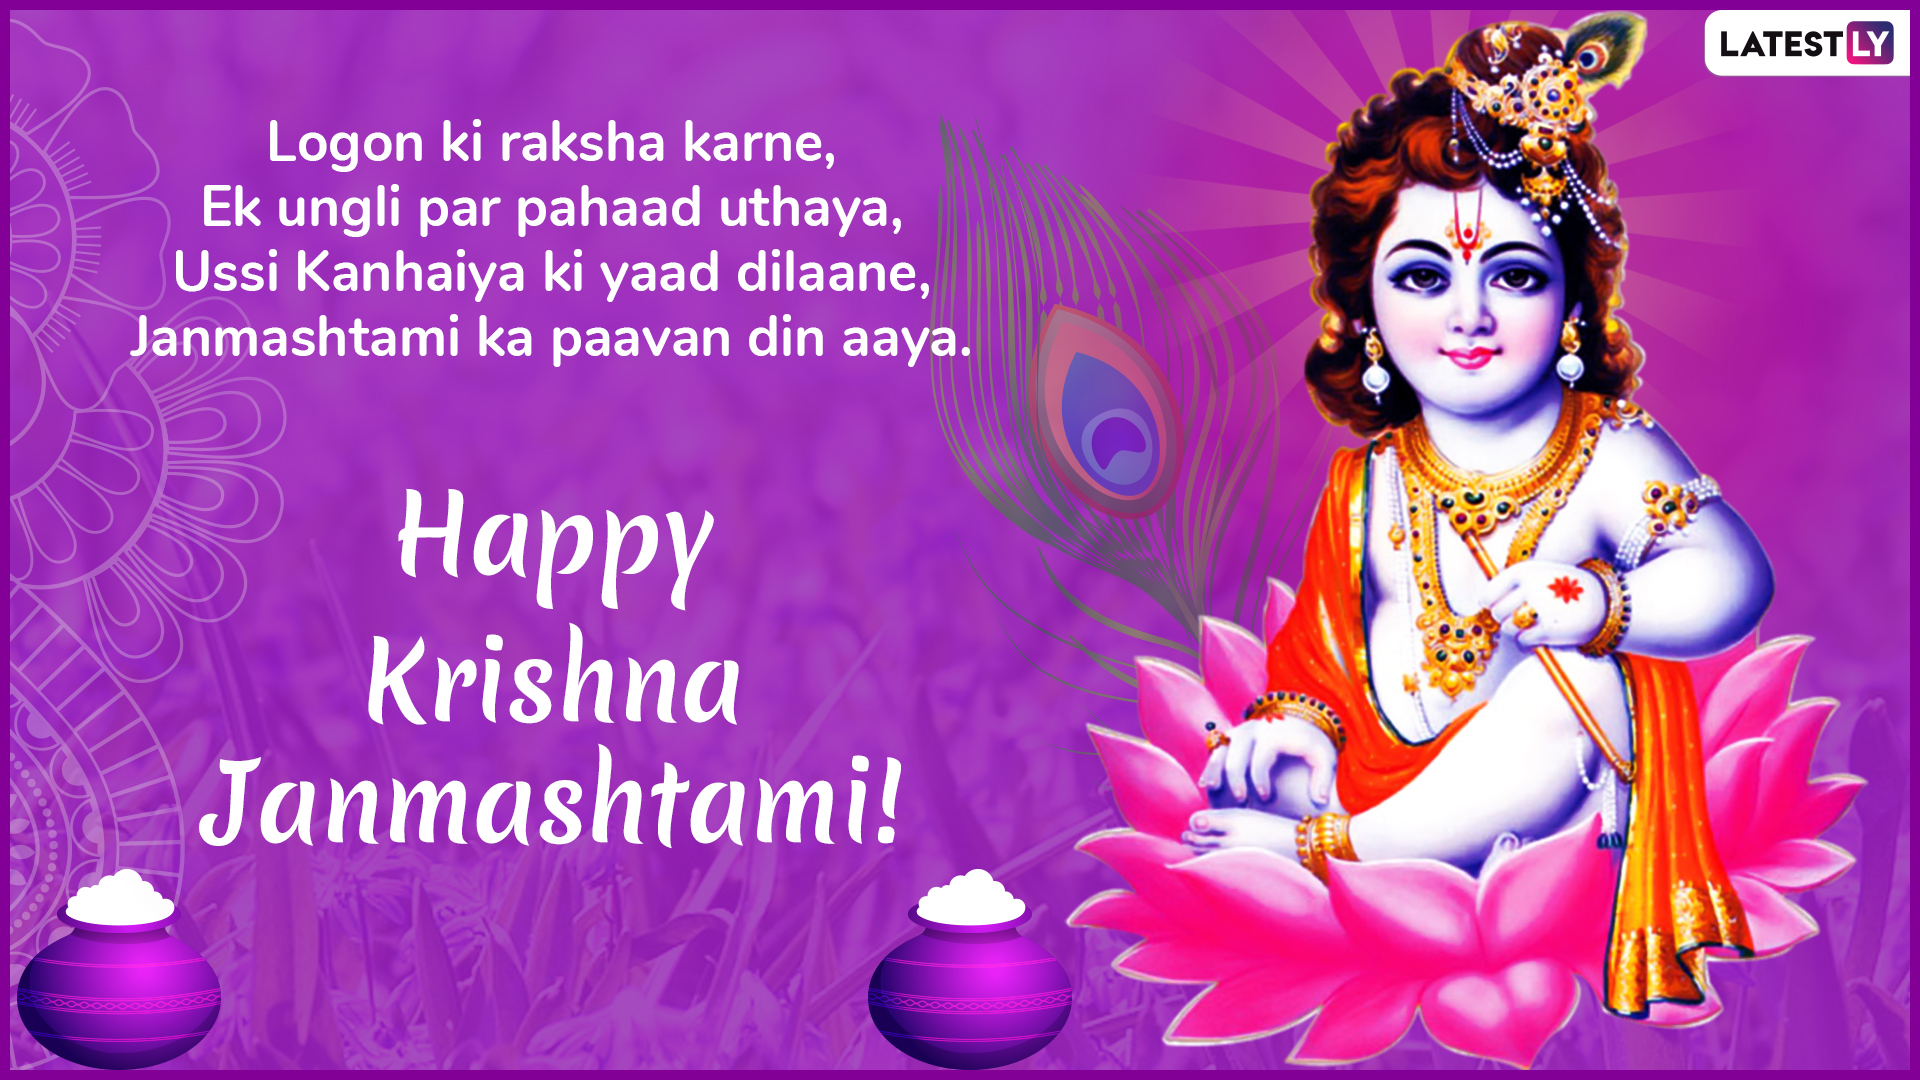 Janmashtami 2019 Hindi Whatsapp Wish 3 (Photo Credits: File Image)